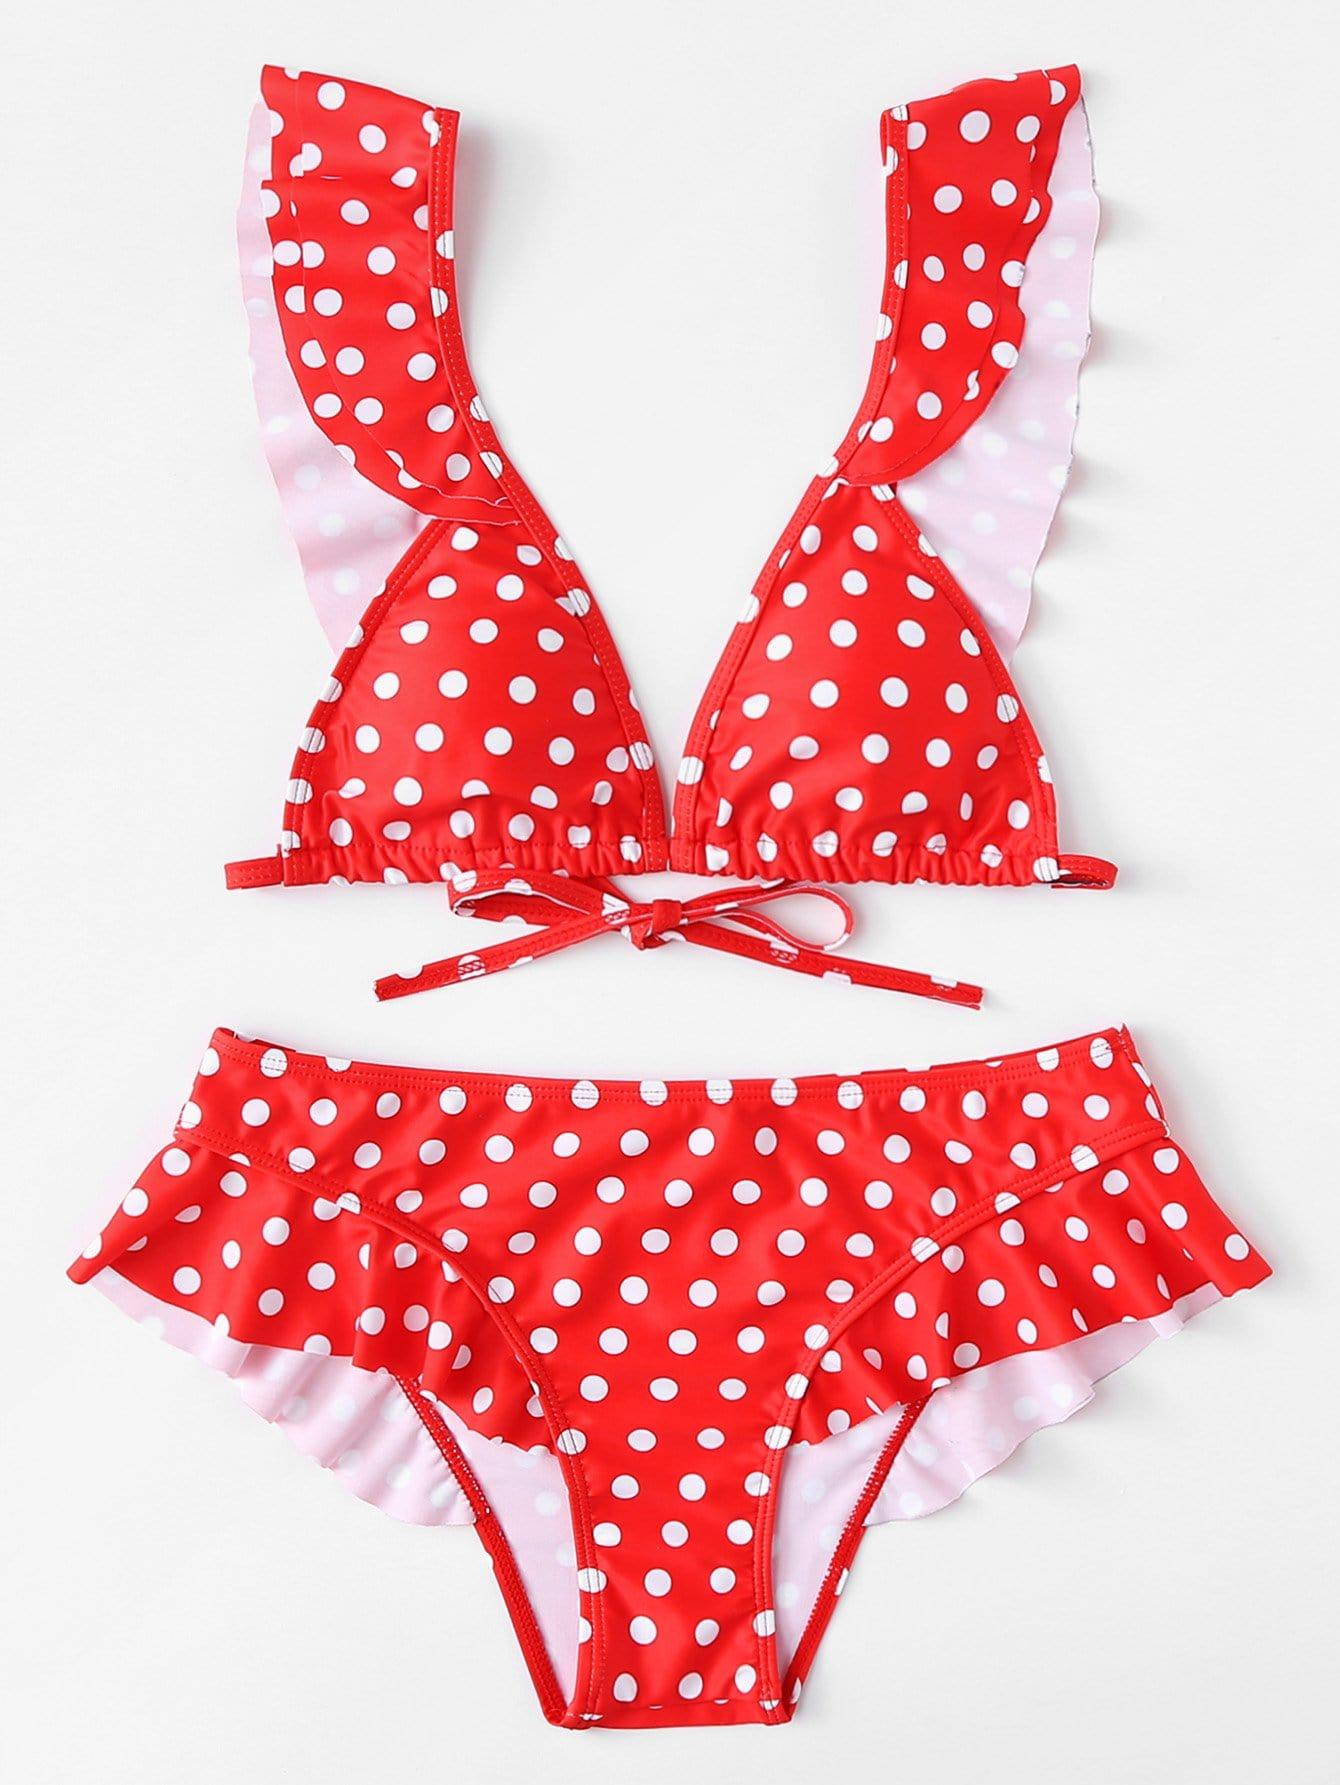 Polka Dot Ruffle Trim Bikini Set crochet ruffle trim halter bikini set